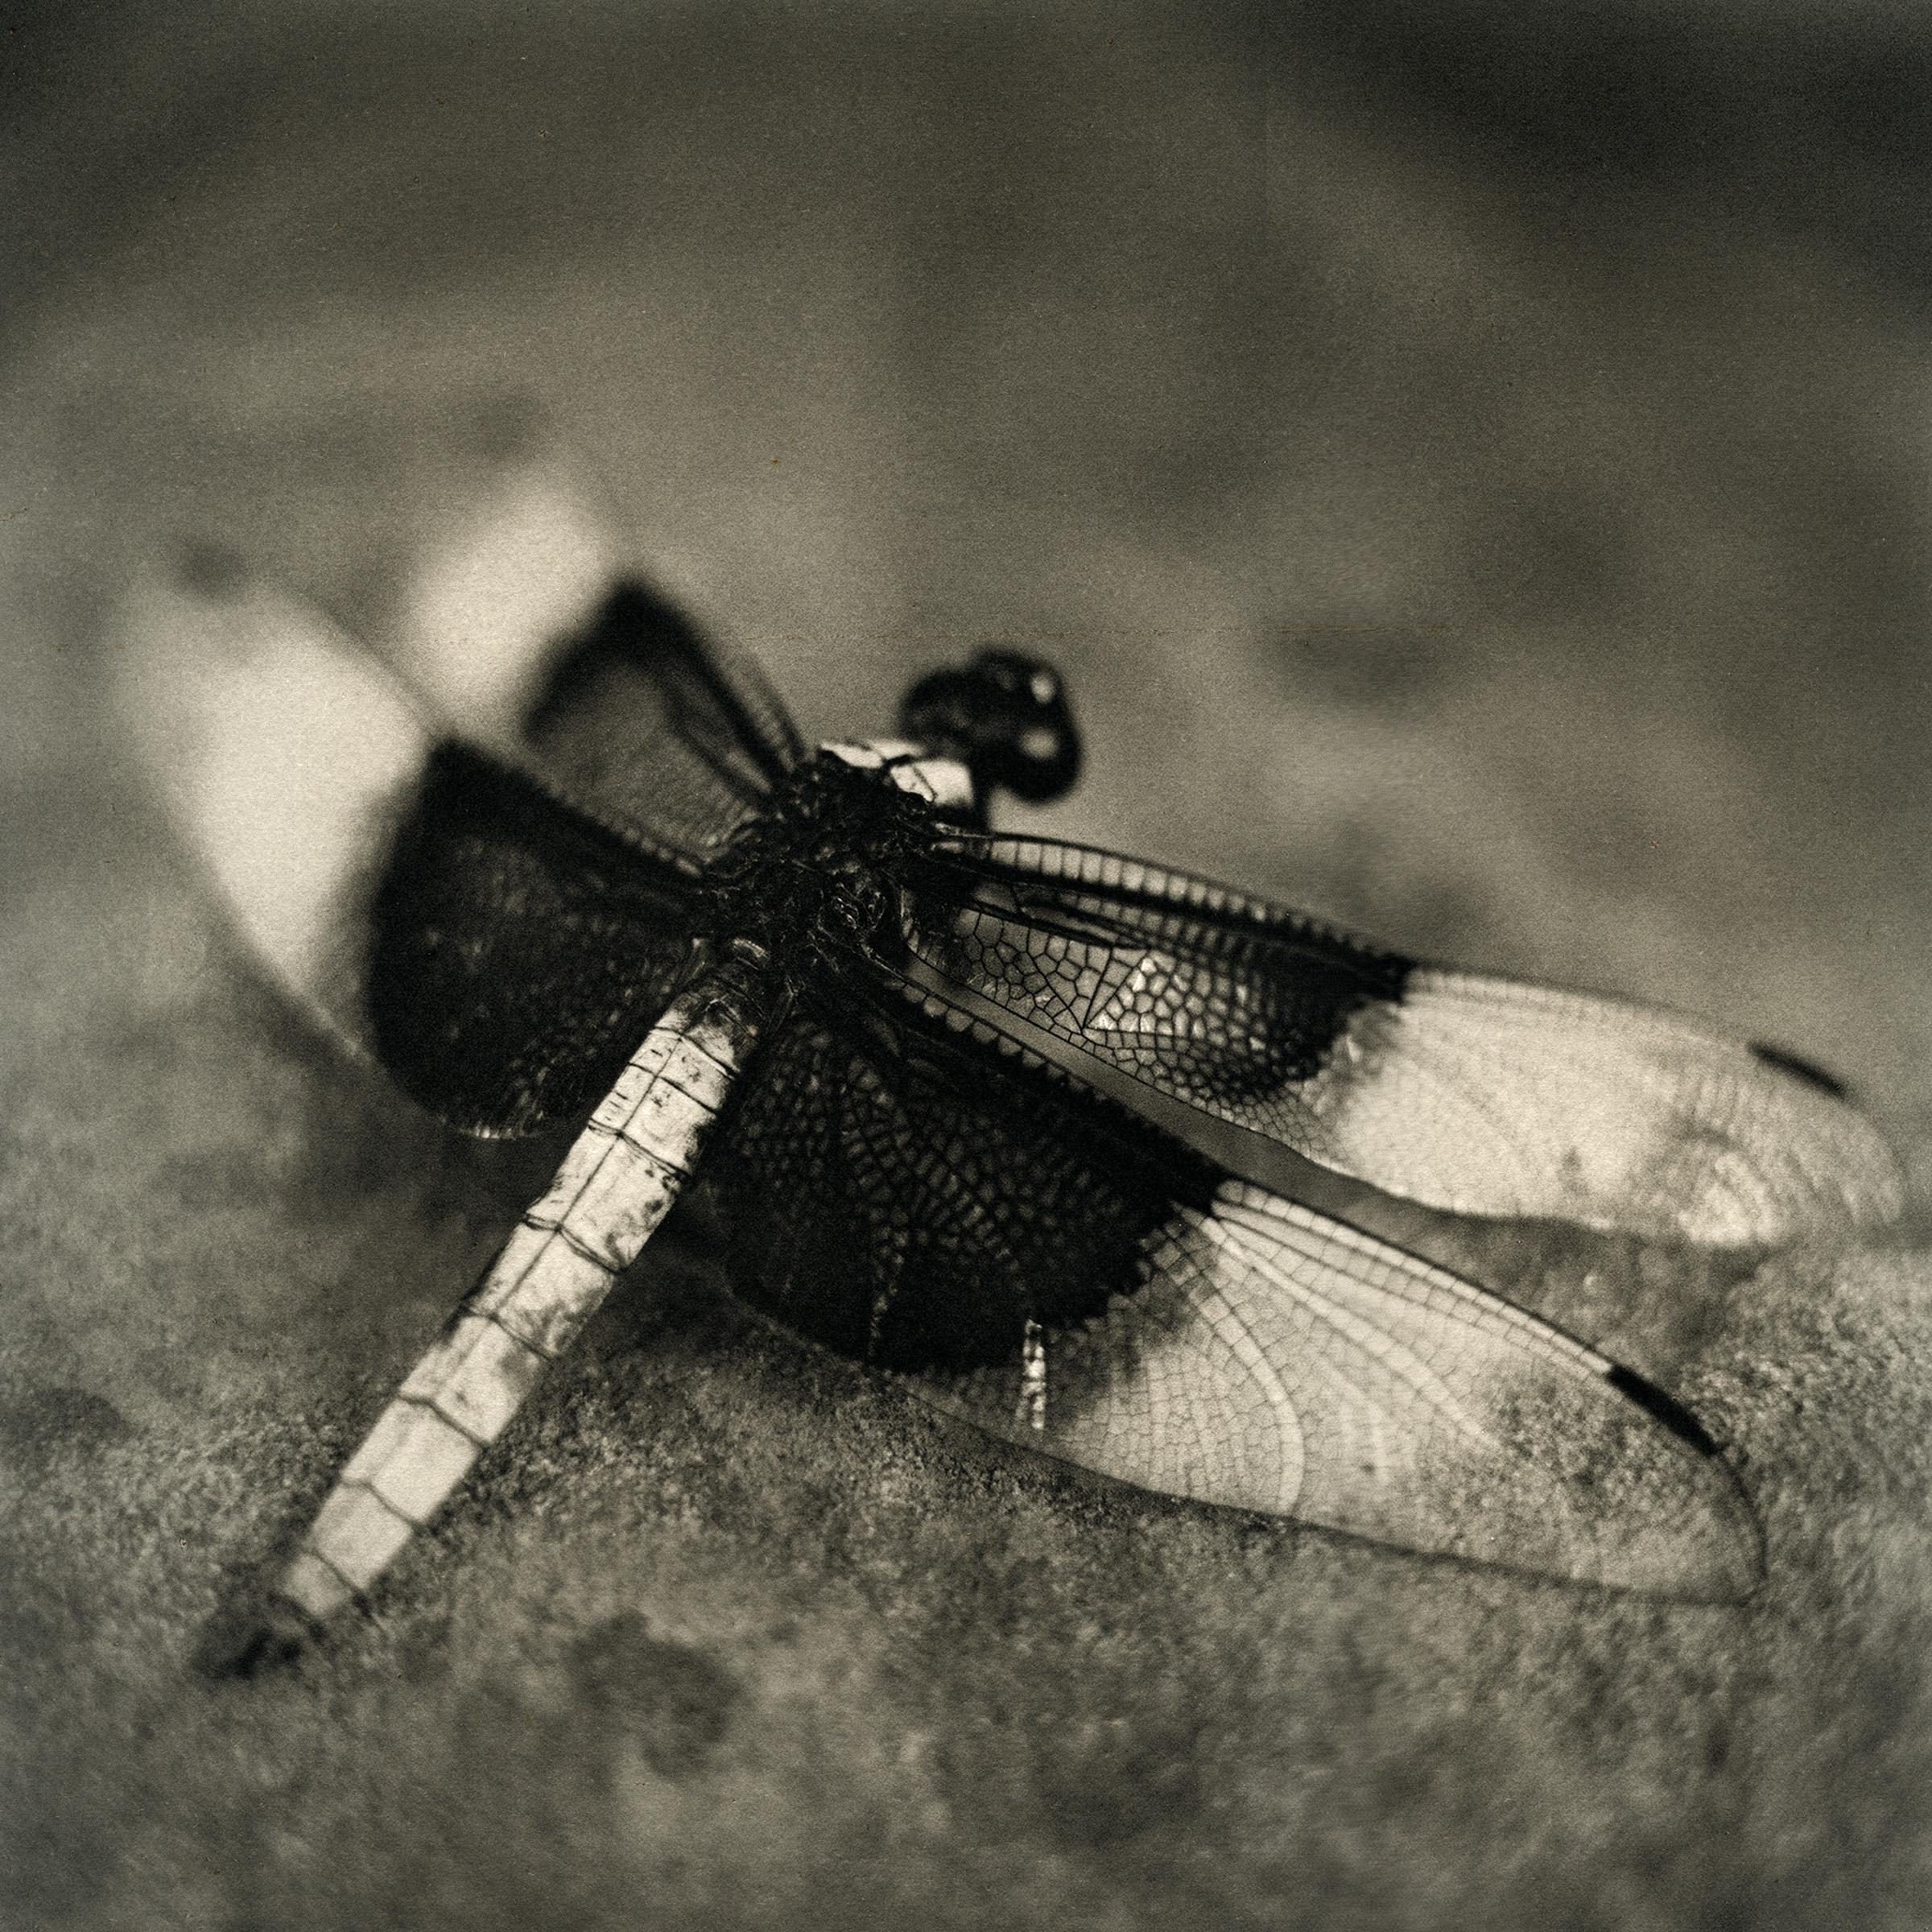 White Tail Skimmer Dragonfly, 2009